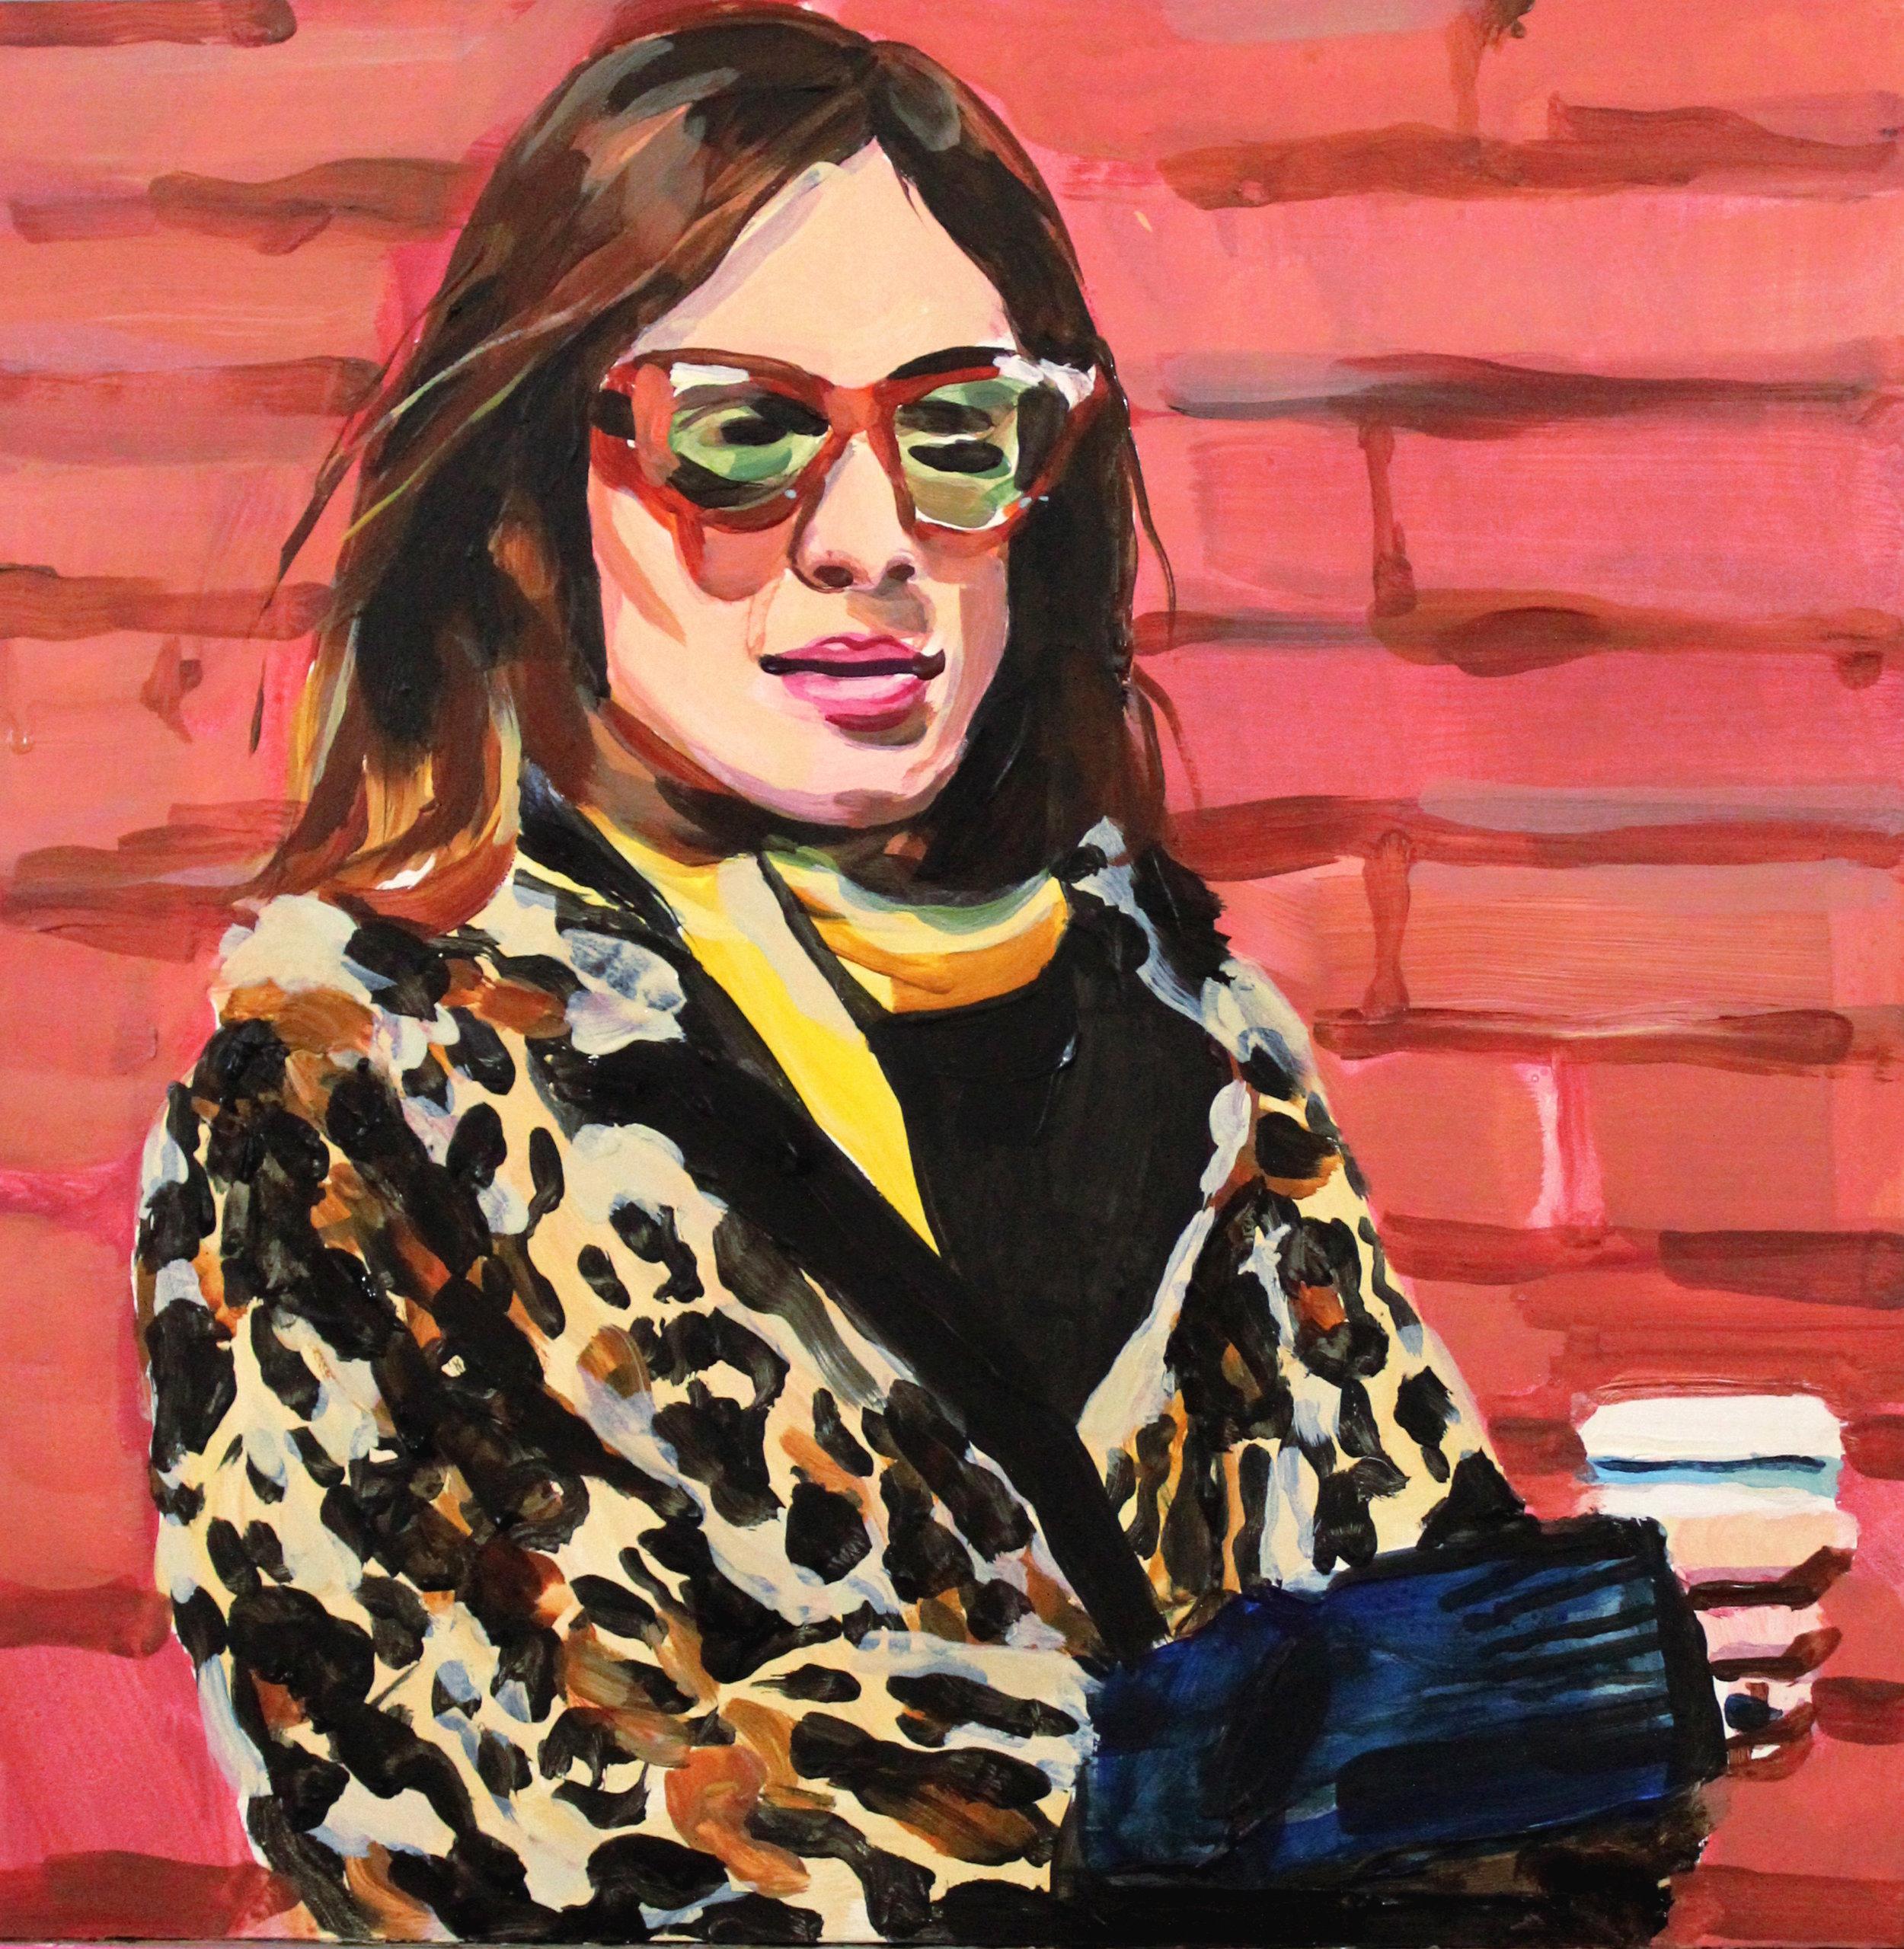 "Alexa Chung in a Leopard Coat   12"" x 12"" acrylic on panel"